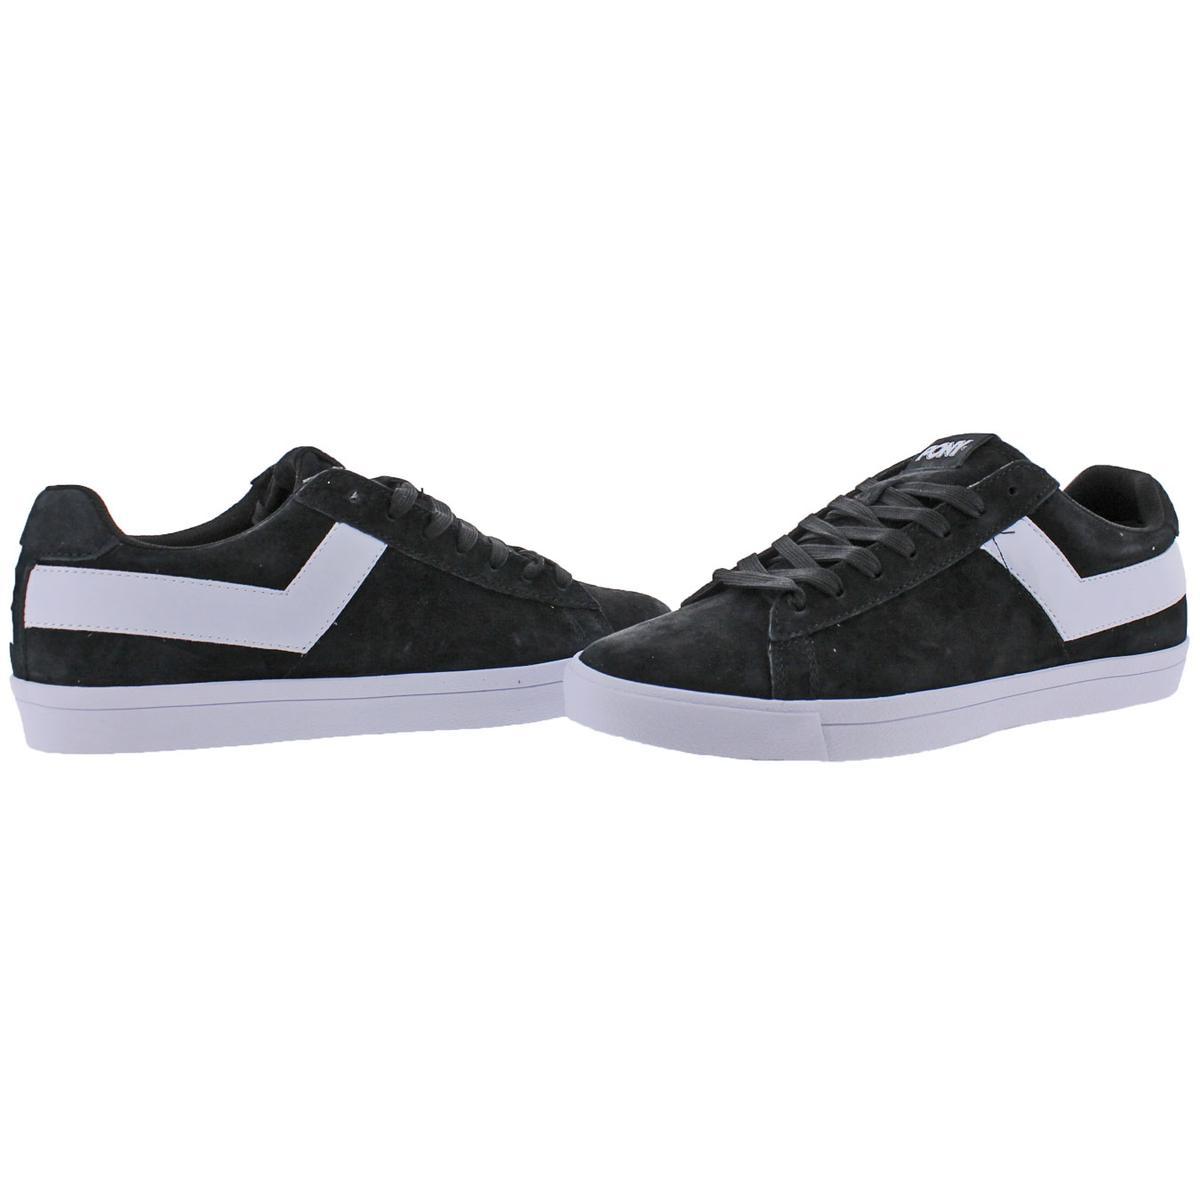 the best attitude eb545 97966 ... Pony Top Star Men s Retro Fashion Fashion Fashion Court Sneakers Shoes  01e070 ...